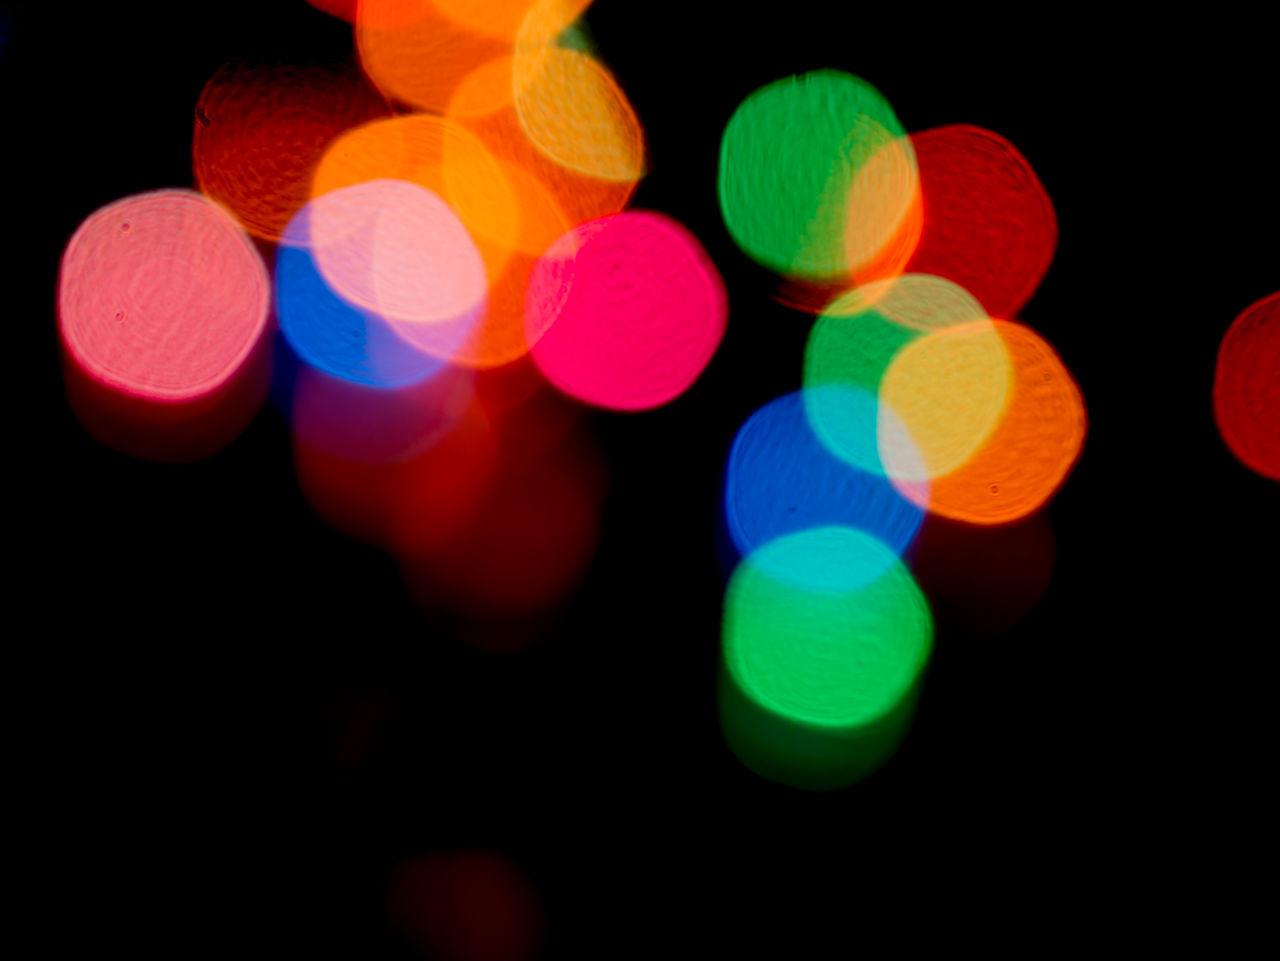 illuminated, lighting equipment, multi colored, night, black background, light effect, colorful, no people, defocused, studio shot, celebration, projection equipment, close-up, disco lights, outdoors